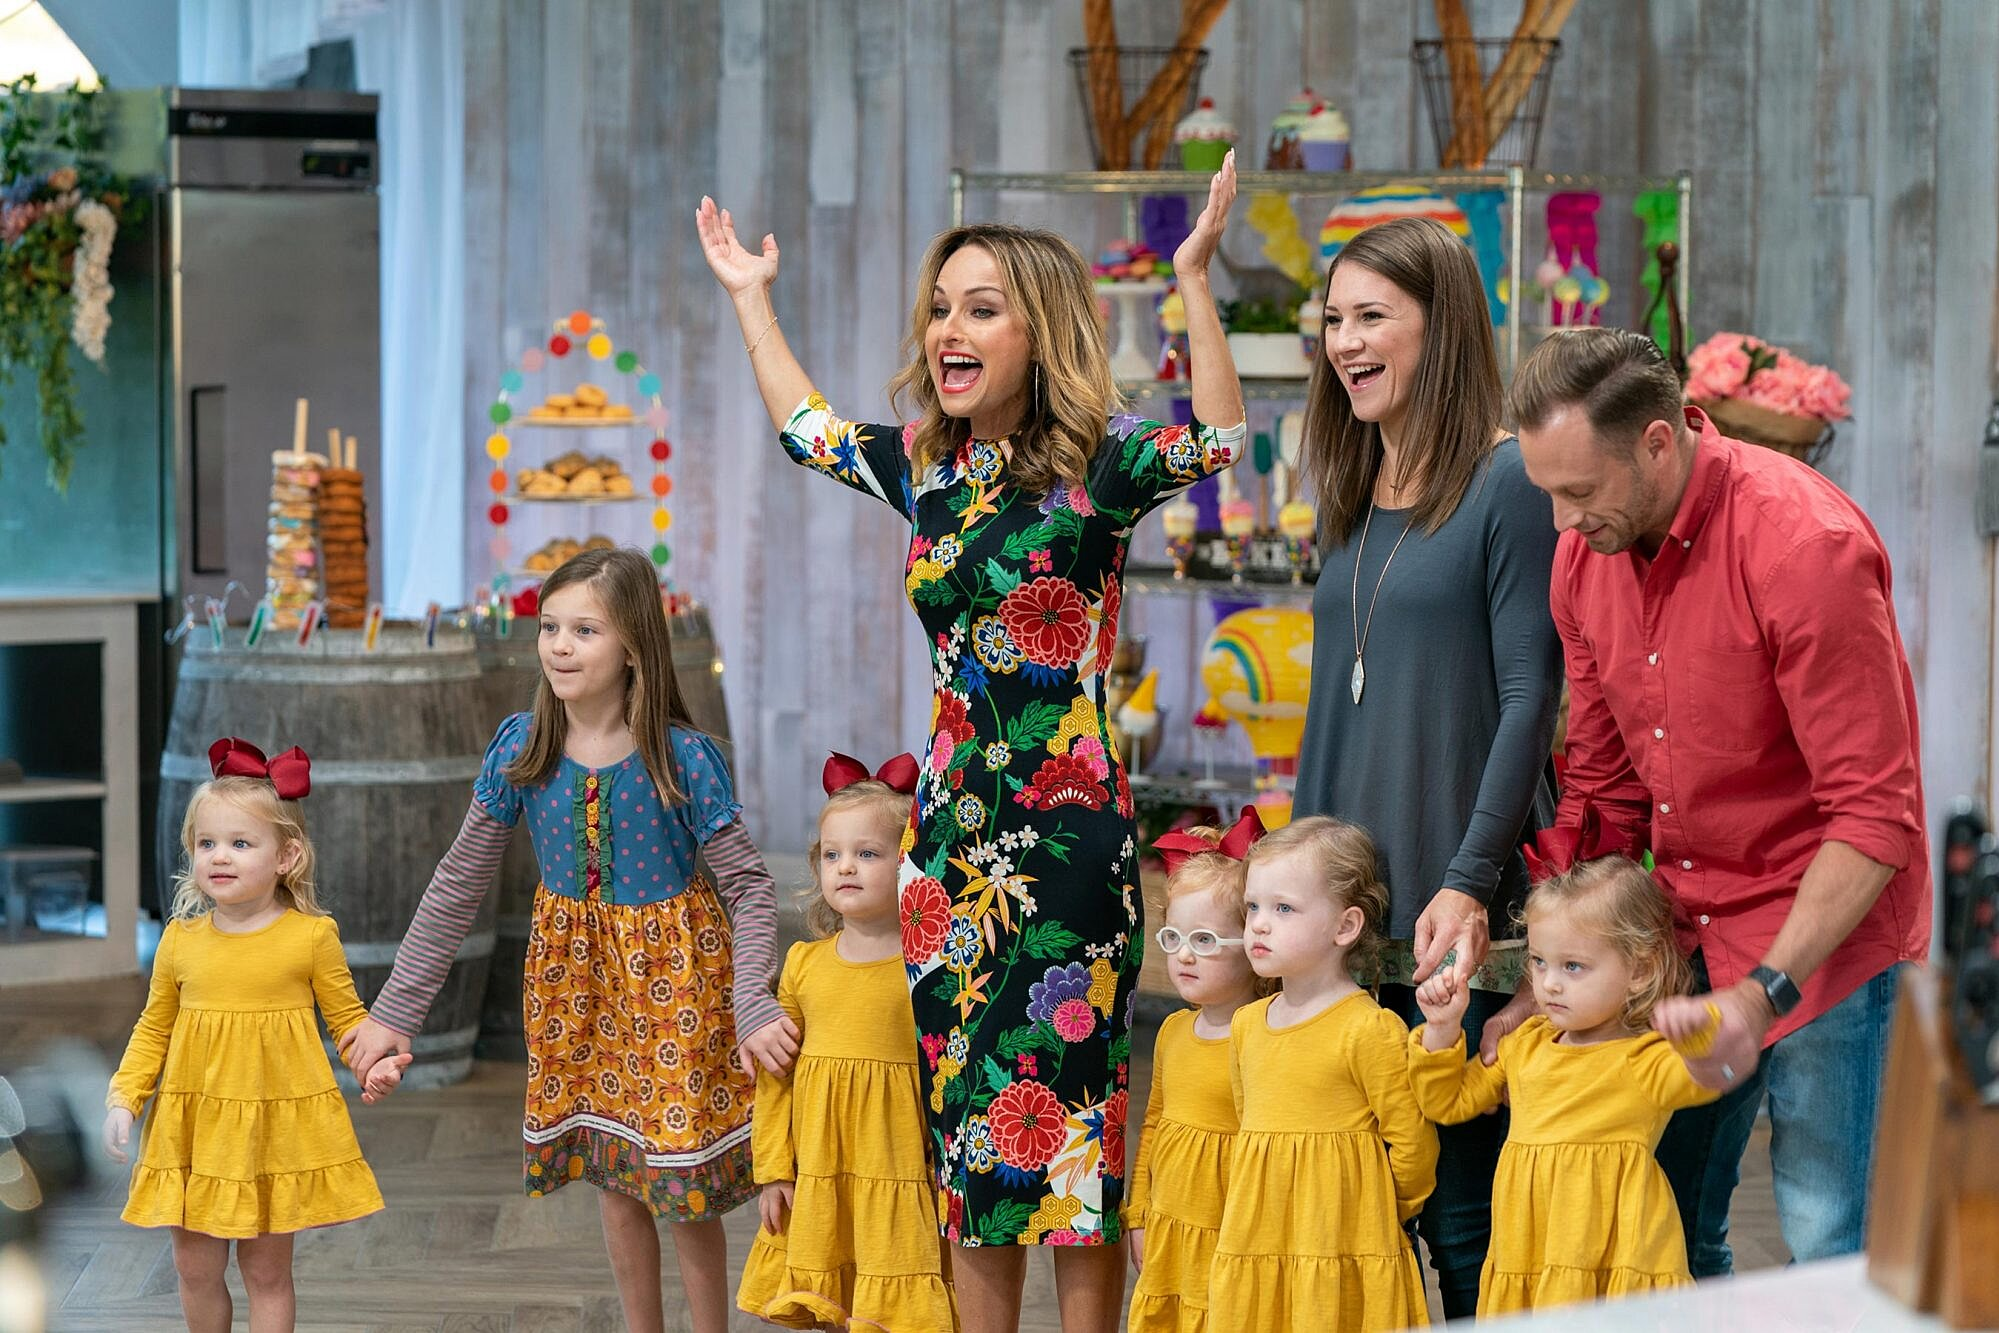 Food Network S Winner Cake All Giada De Laurentiis Welcomes Busby Family In Premiere Ew Com